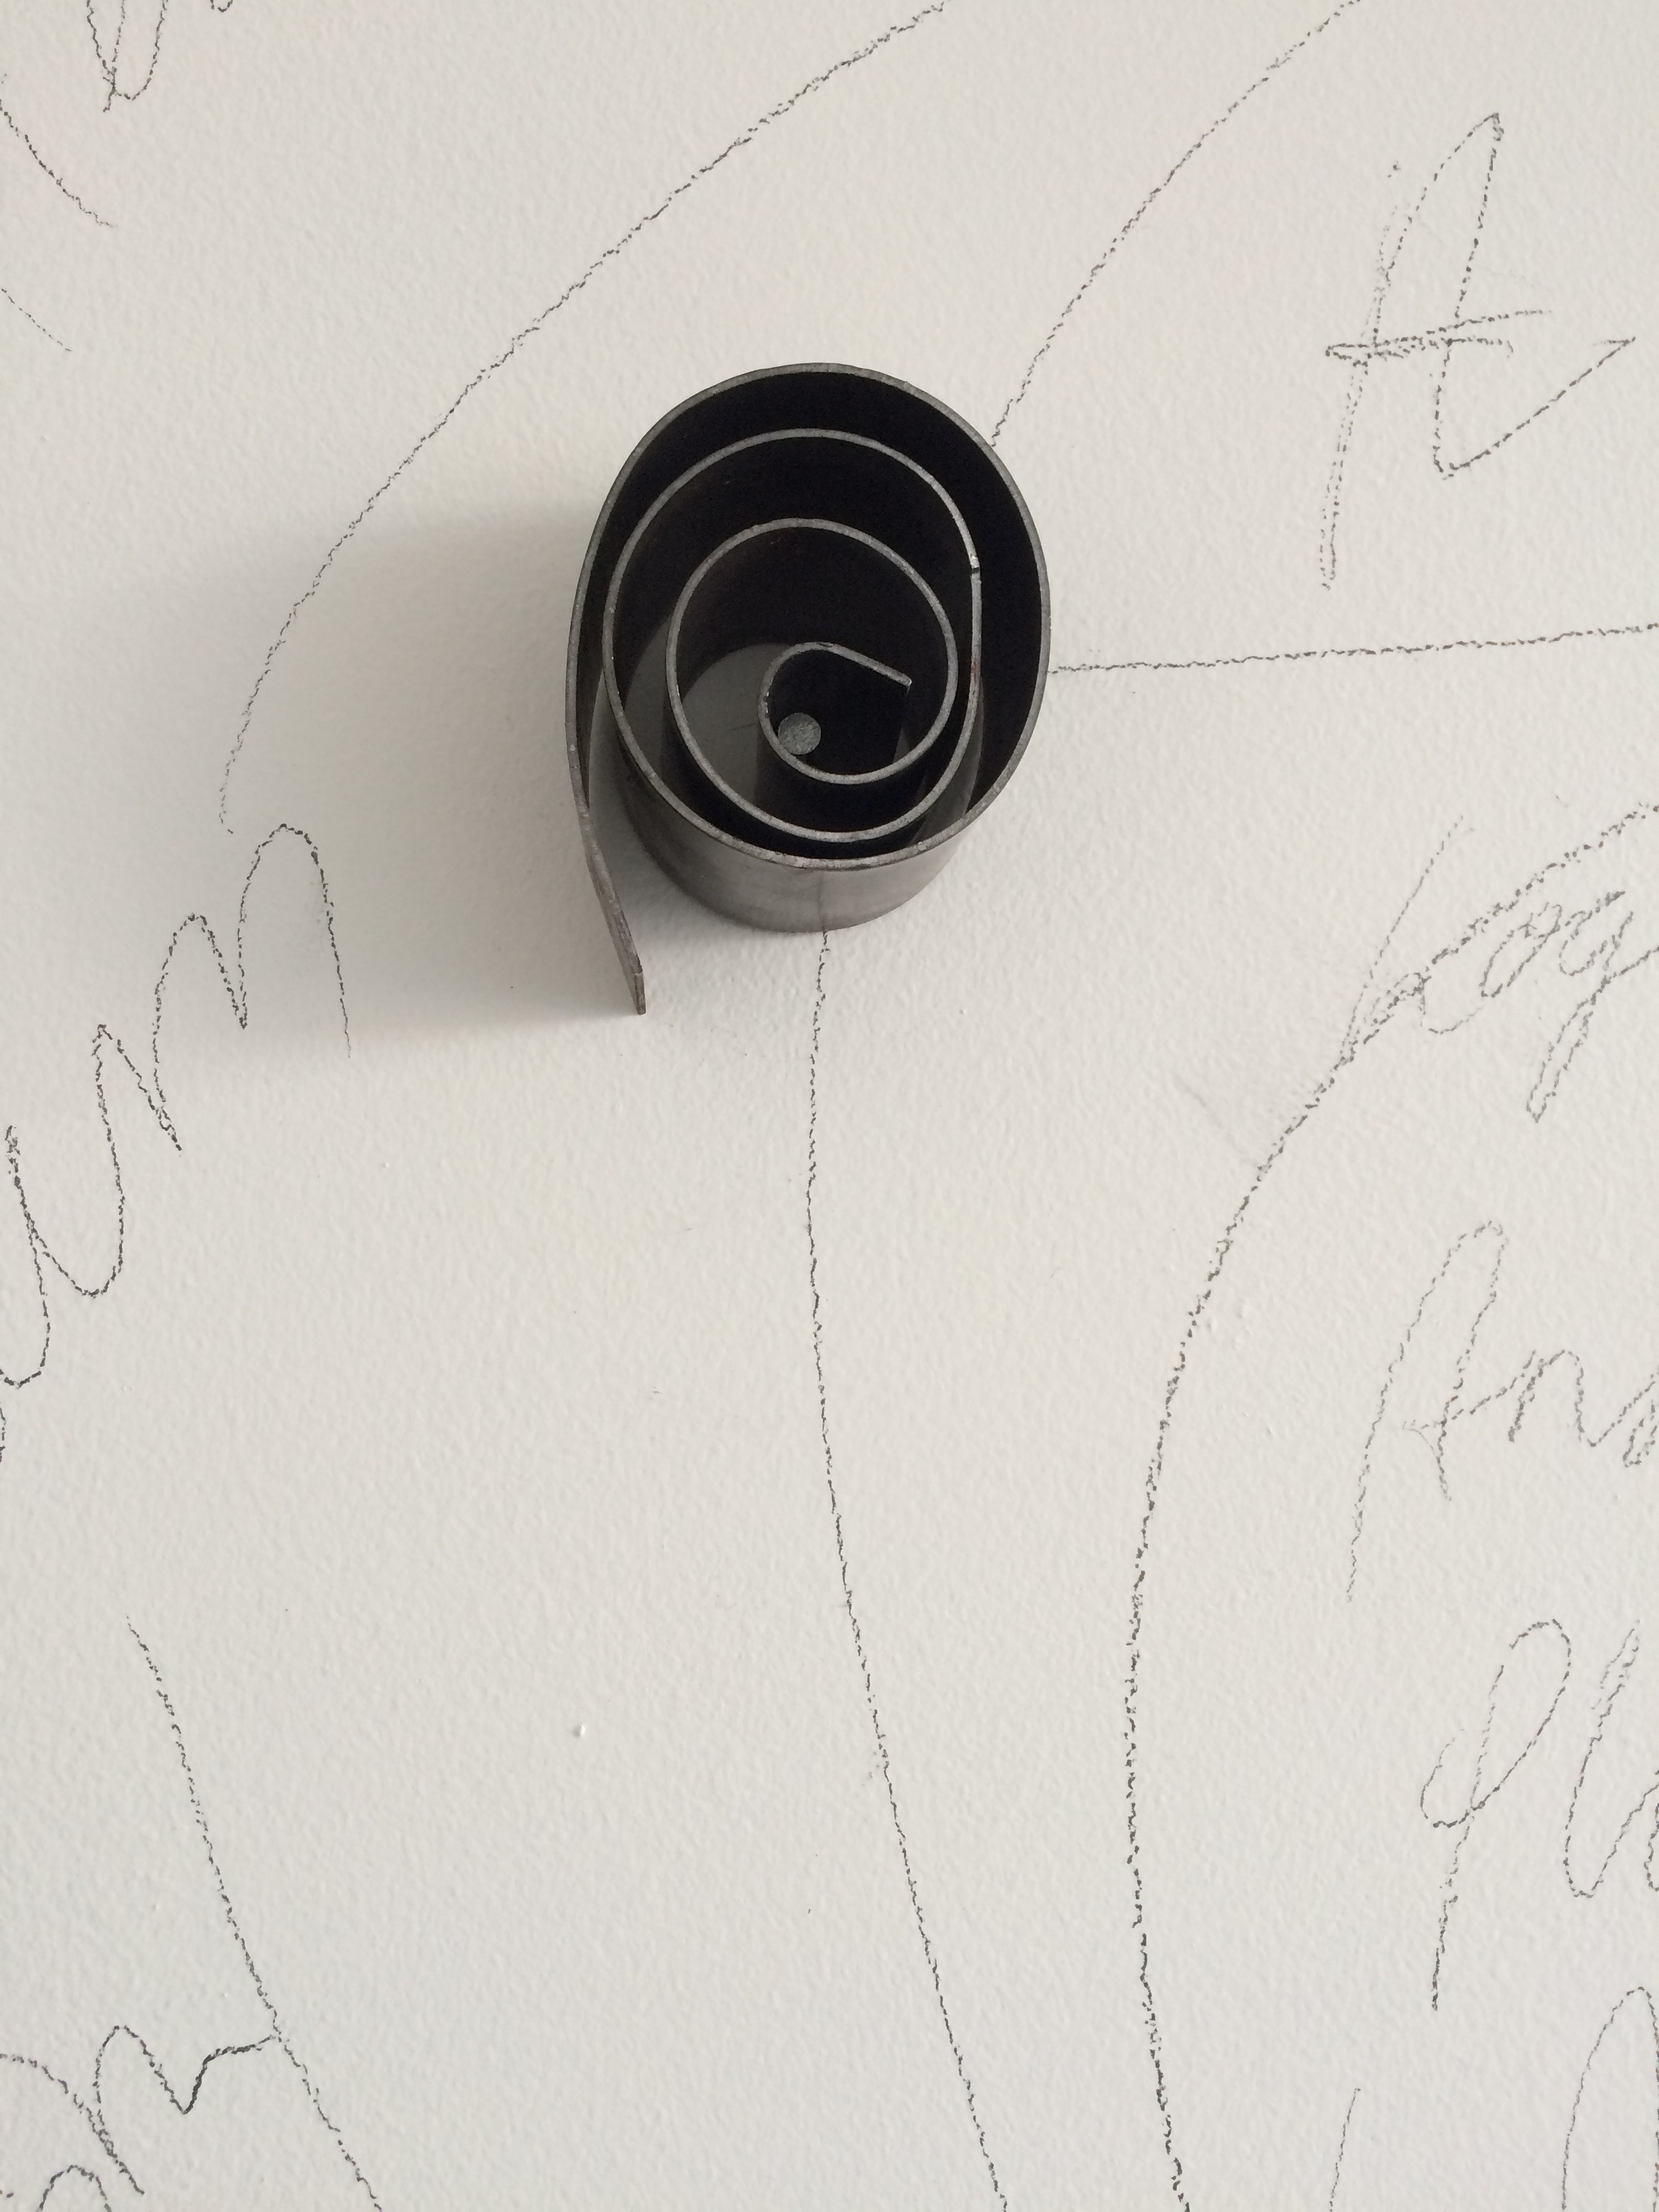 folded metal on nail in studio